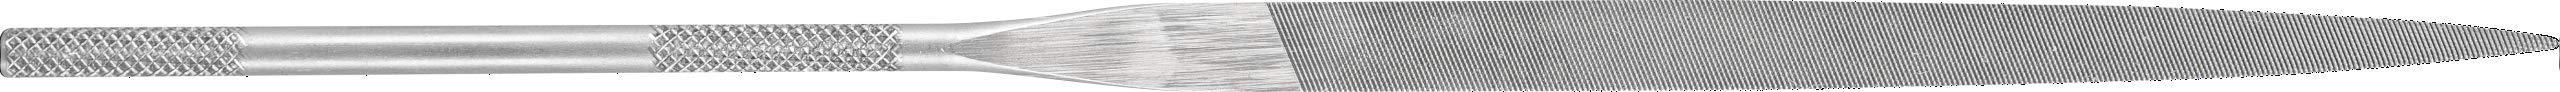 PFERD 12050 Precision Needle Flat File, Swiss Pattern, Cut 2, 5-1/2'' Length, 7/64'' Shank Diameter (Pack of 12)